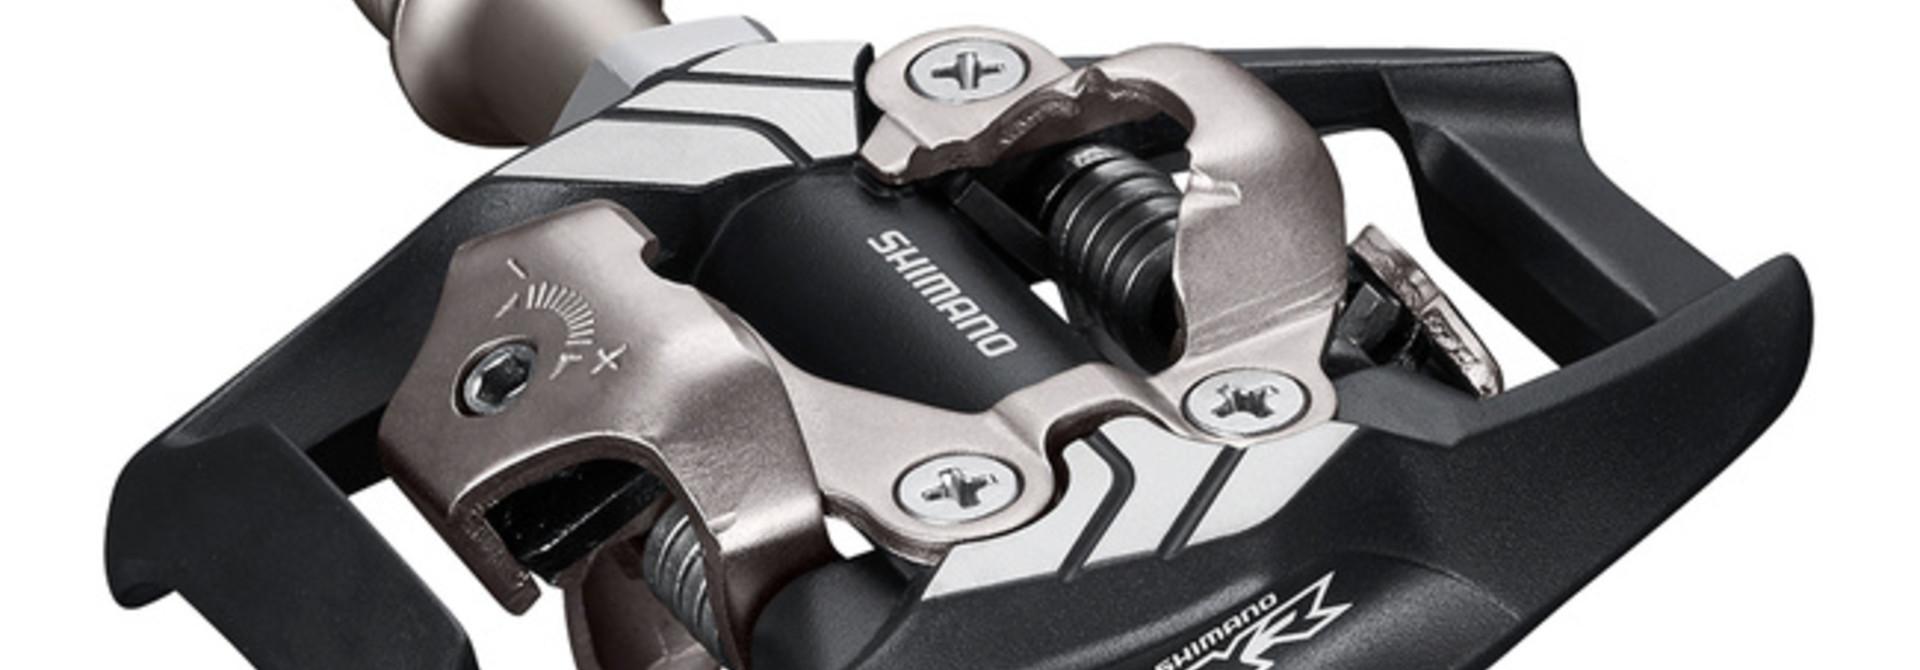 Shimano Pedal, PD-MX70, DXR, SPD Pedal, W/O Reflector, W/Cleat